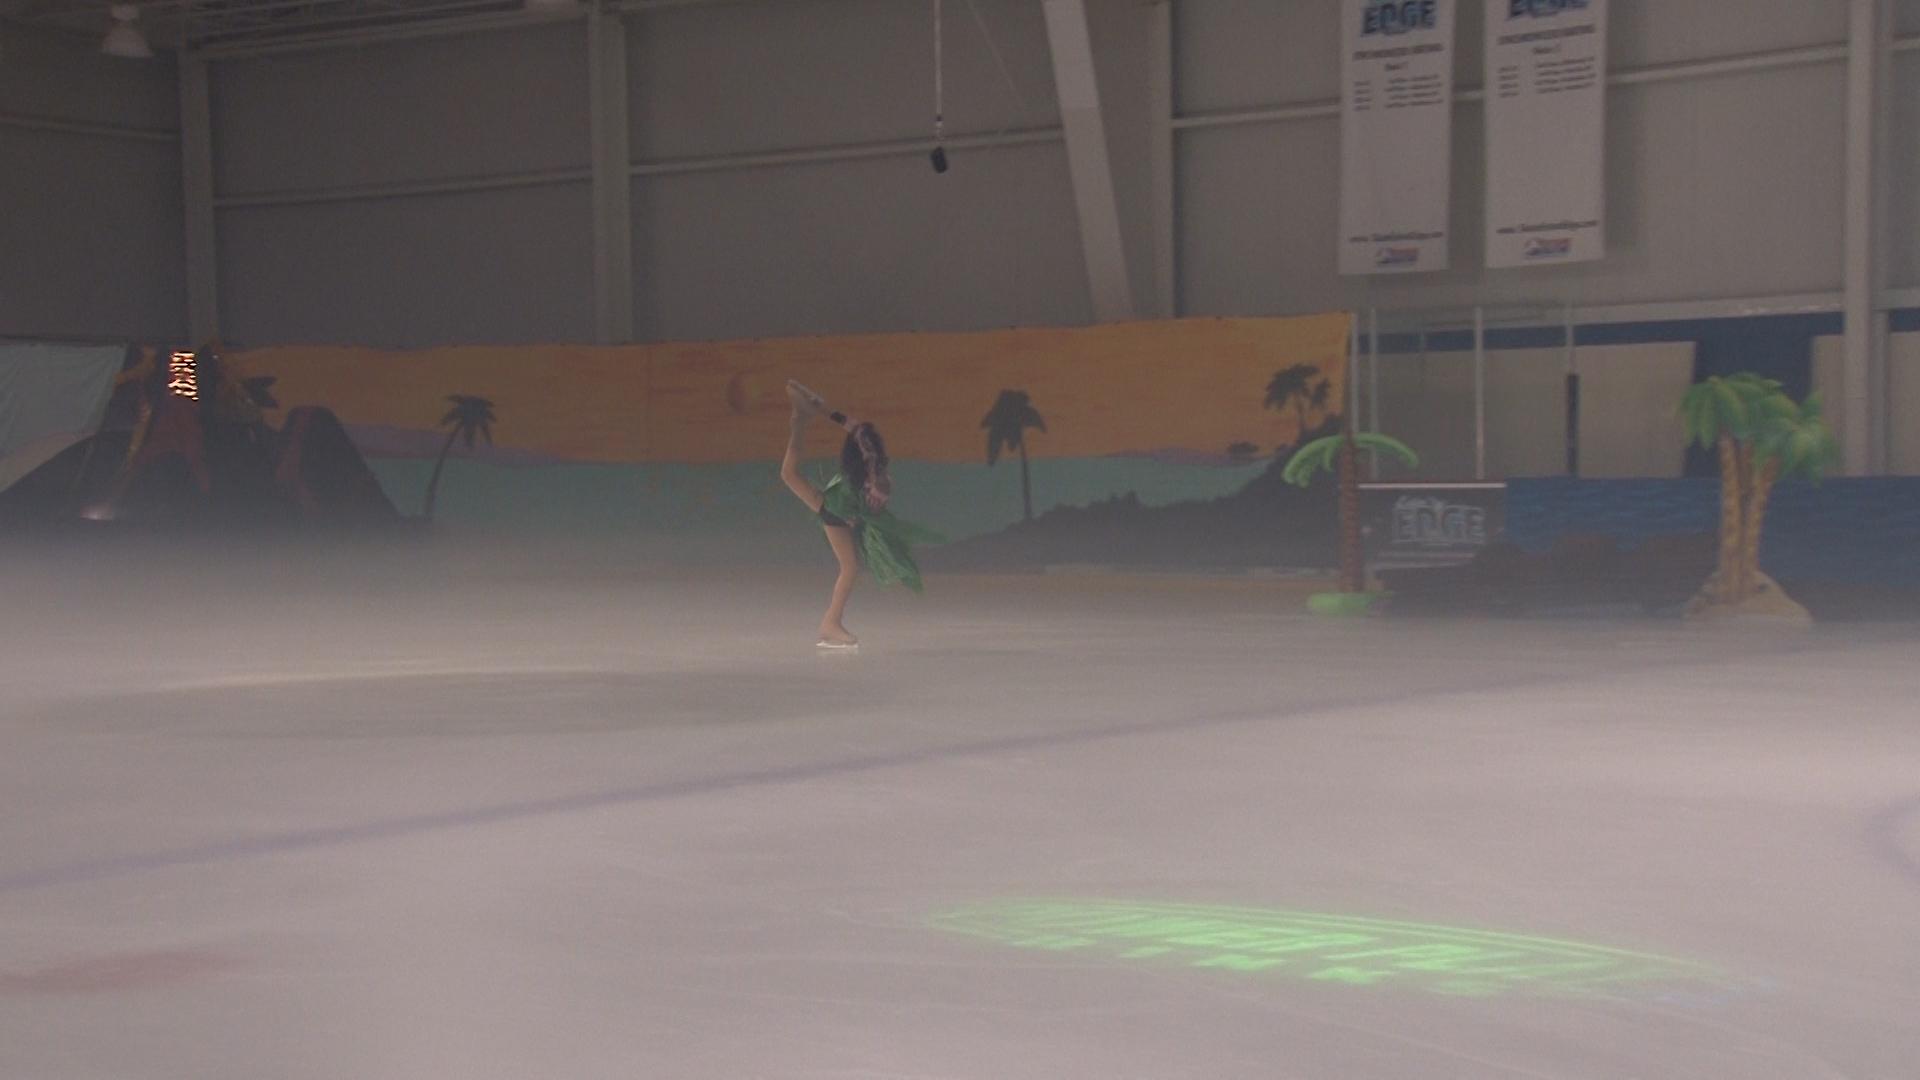 Power Play Maui Skate on Ice 071417.00_32_39_04.Still053.jpg